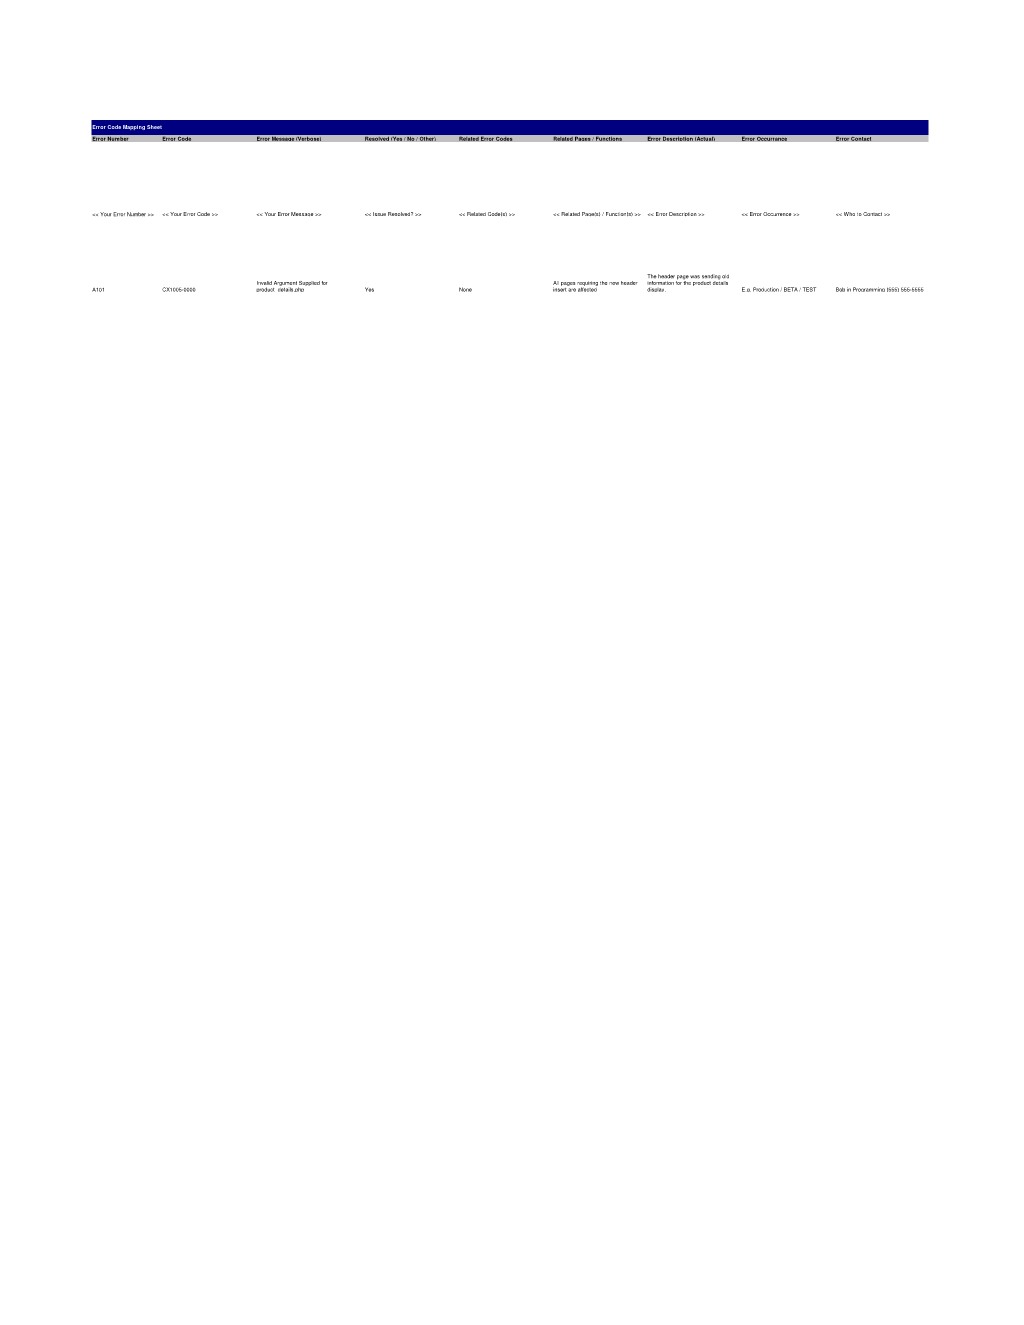 Error Code Mapping Worksheet